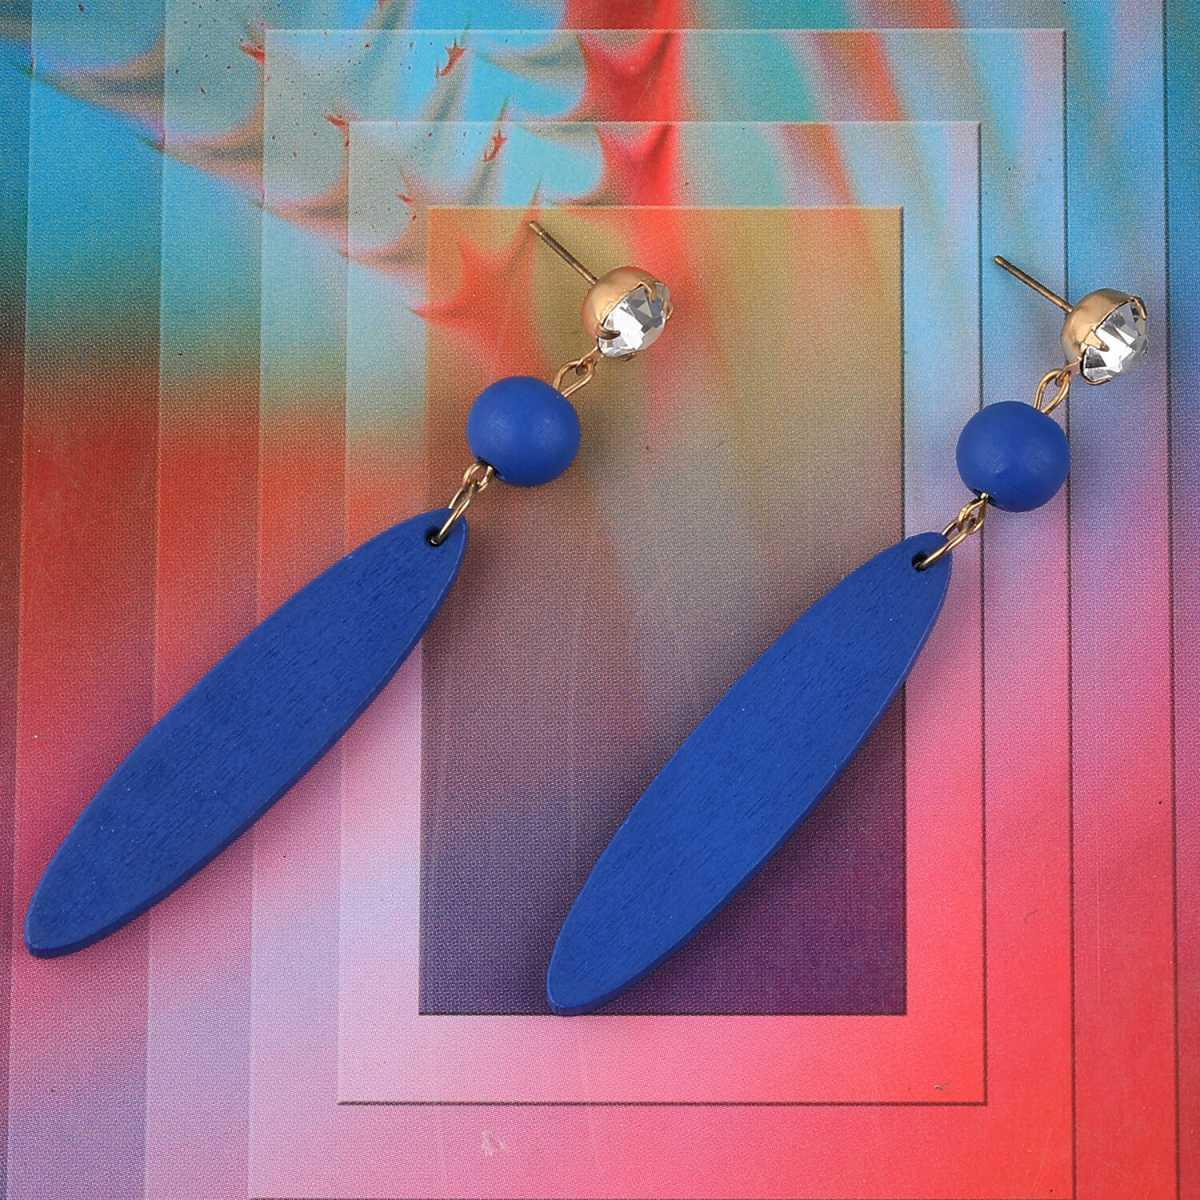 SILVER SHINE Stylish Dangler Blue Wooden Earrings Light Weight Fashion Earring For Girls and Women